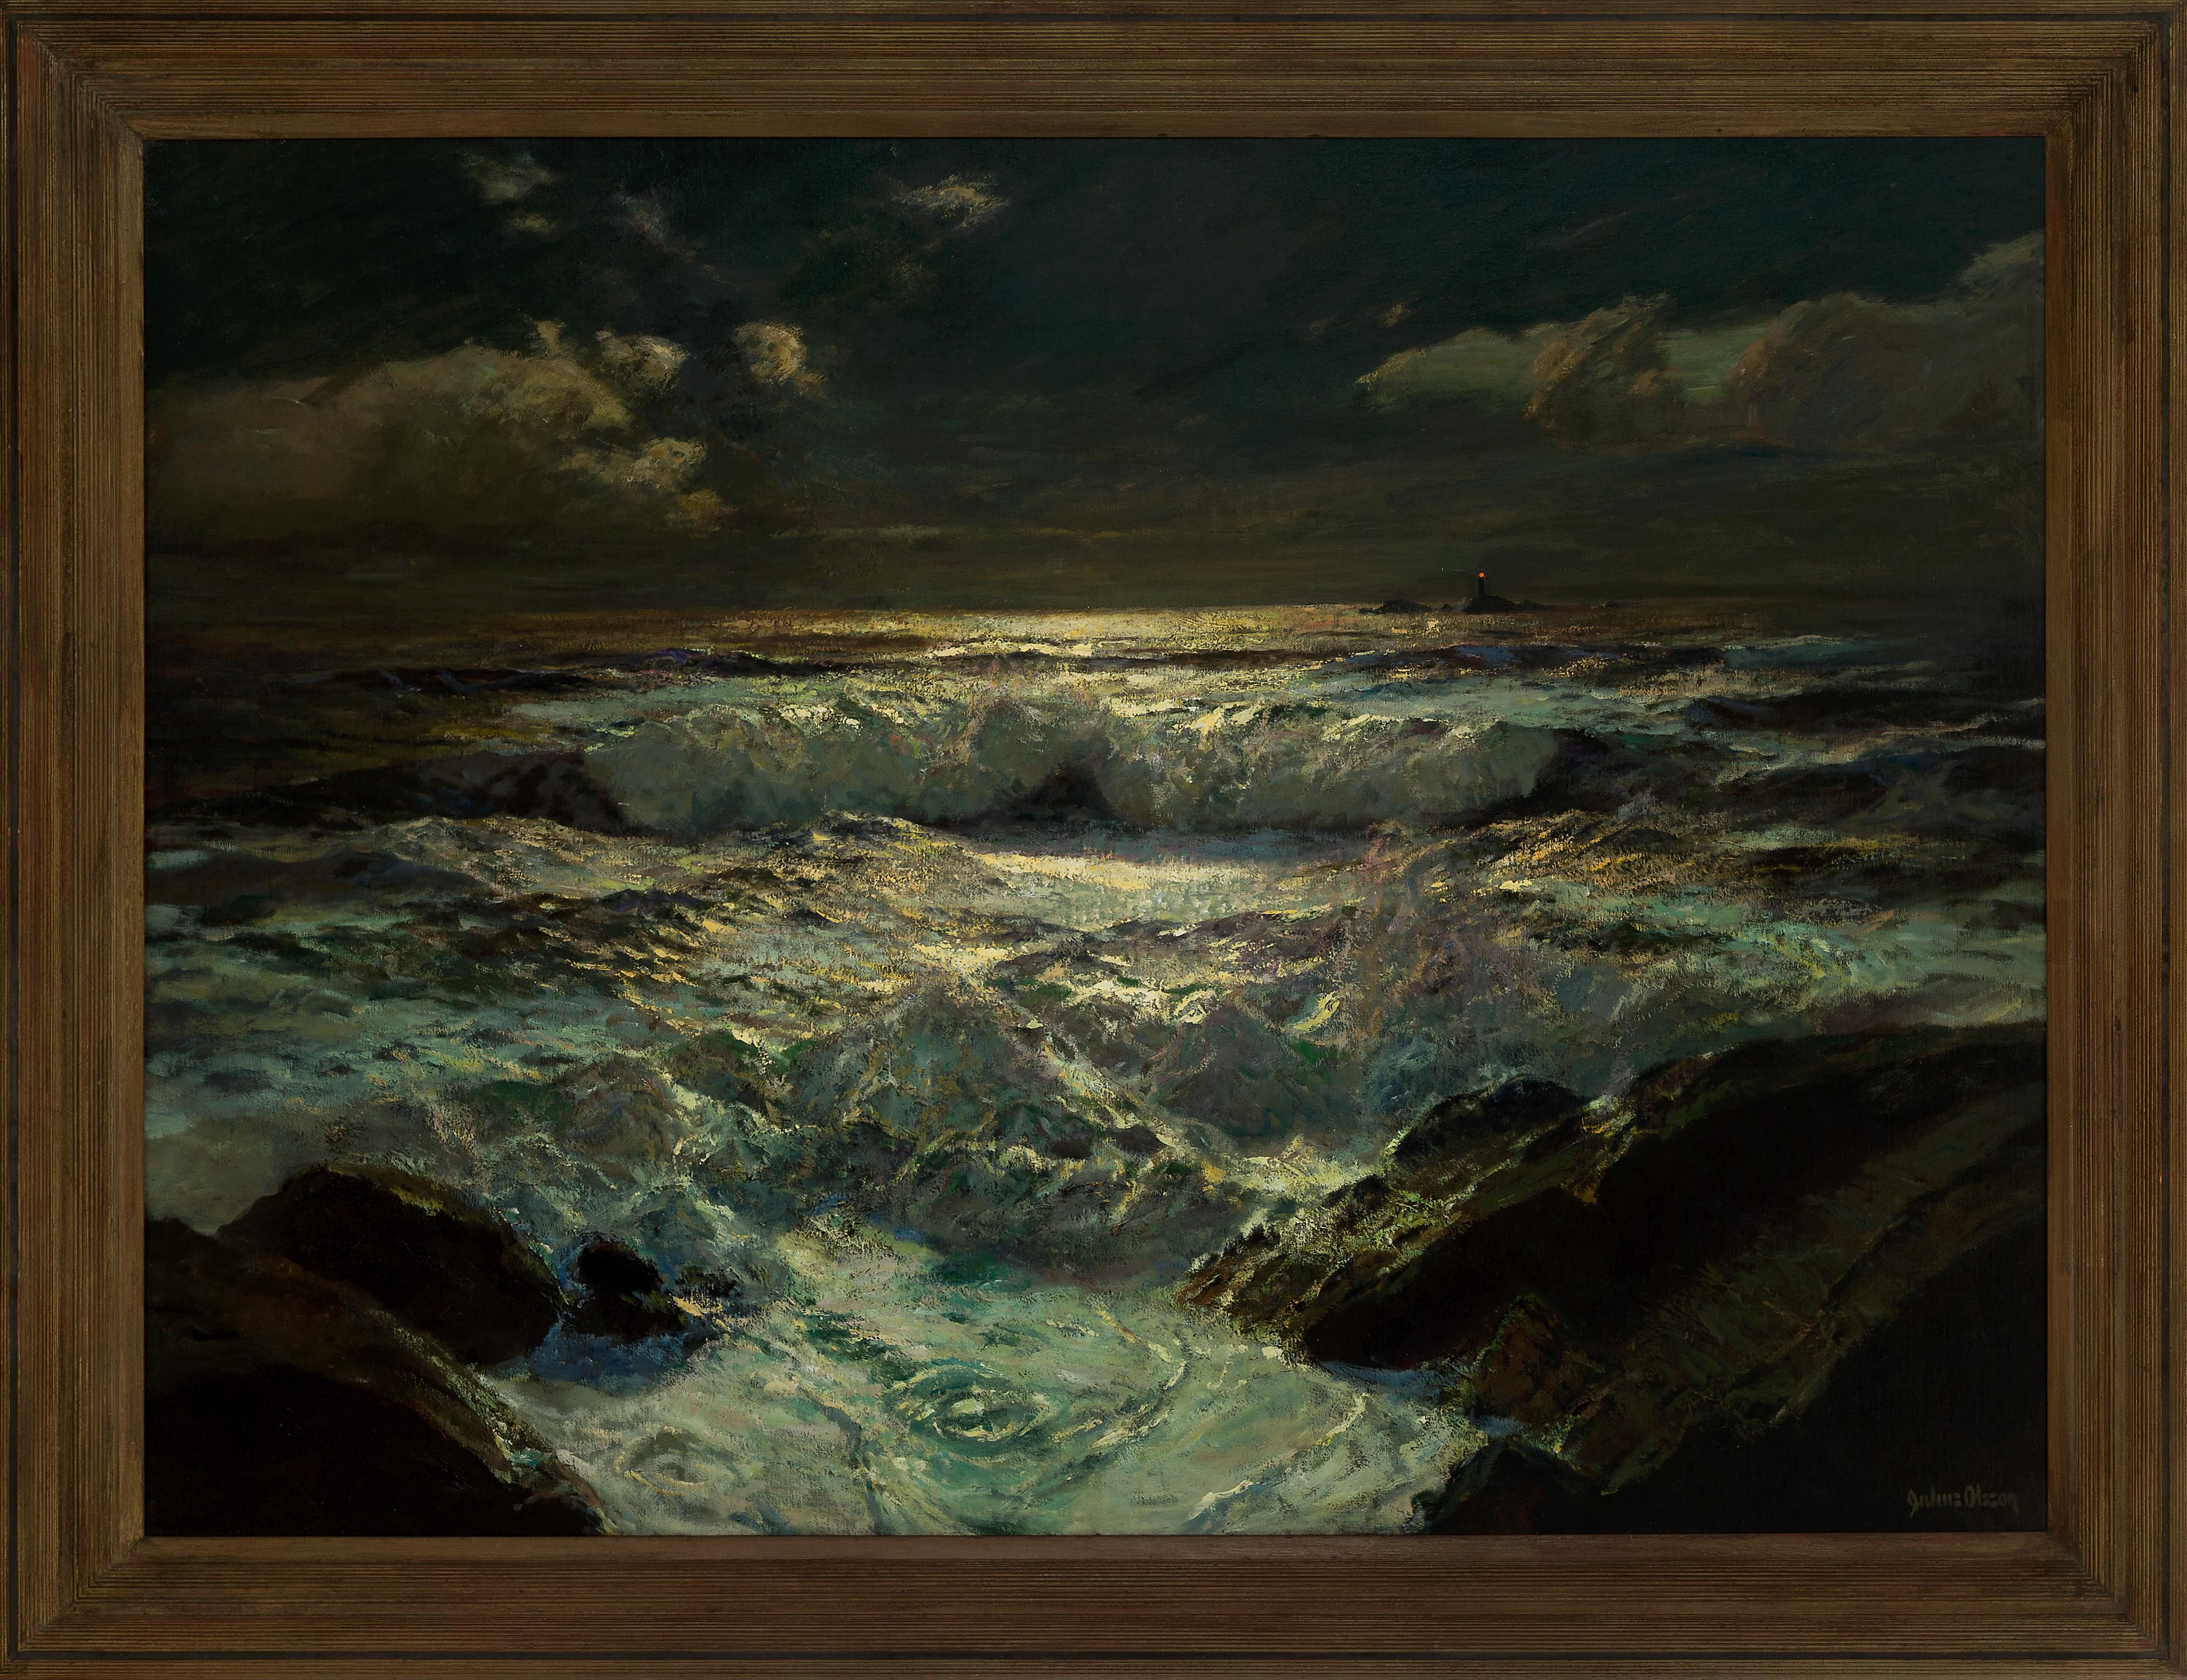 The Longships Light - 20th Century, Oil Paint, Seascape Painting